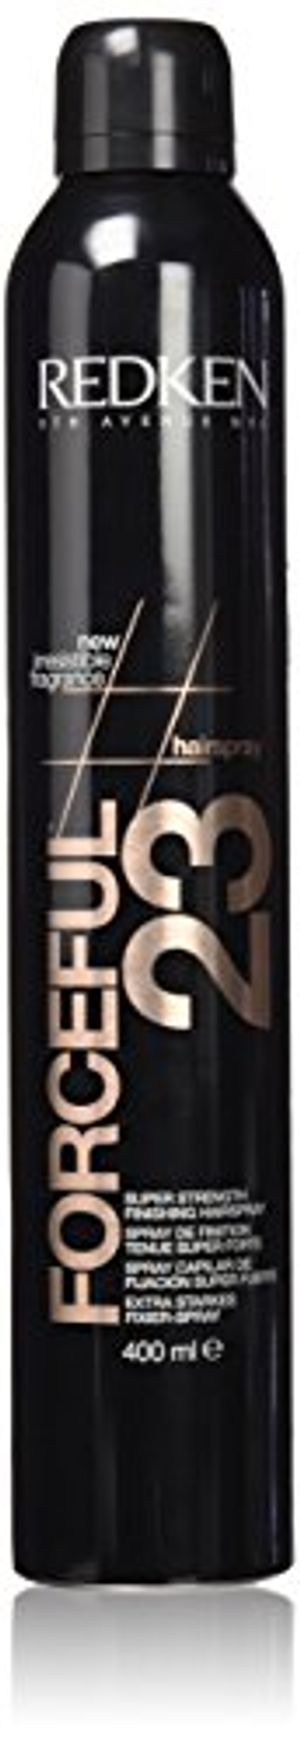 Buy Redken Styling Forceful 23 Super Strength Finishing Spray - 400 ml con el envío libre